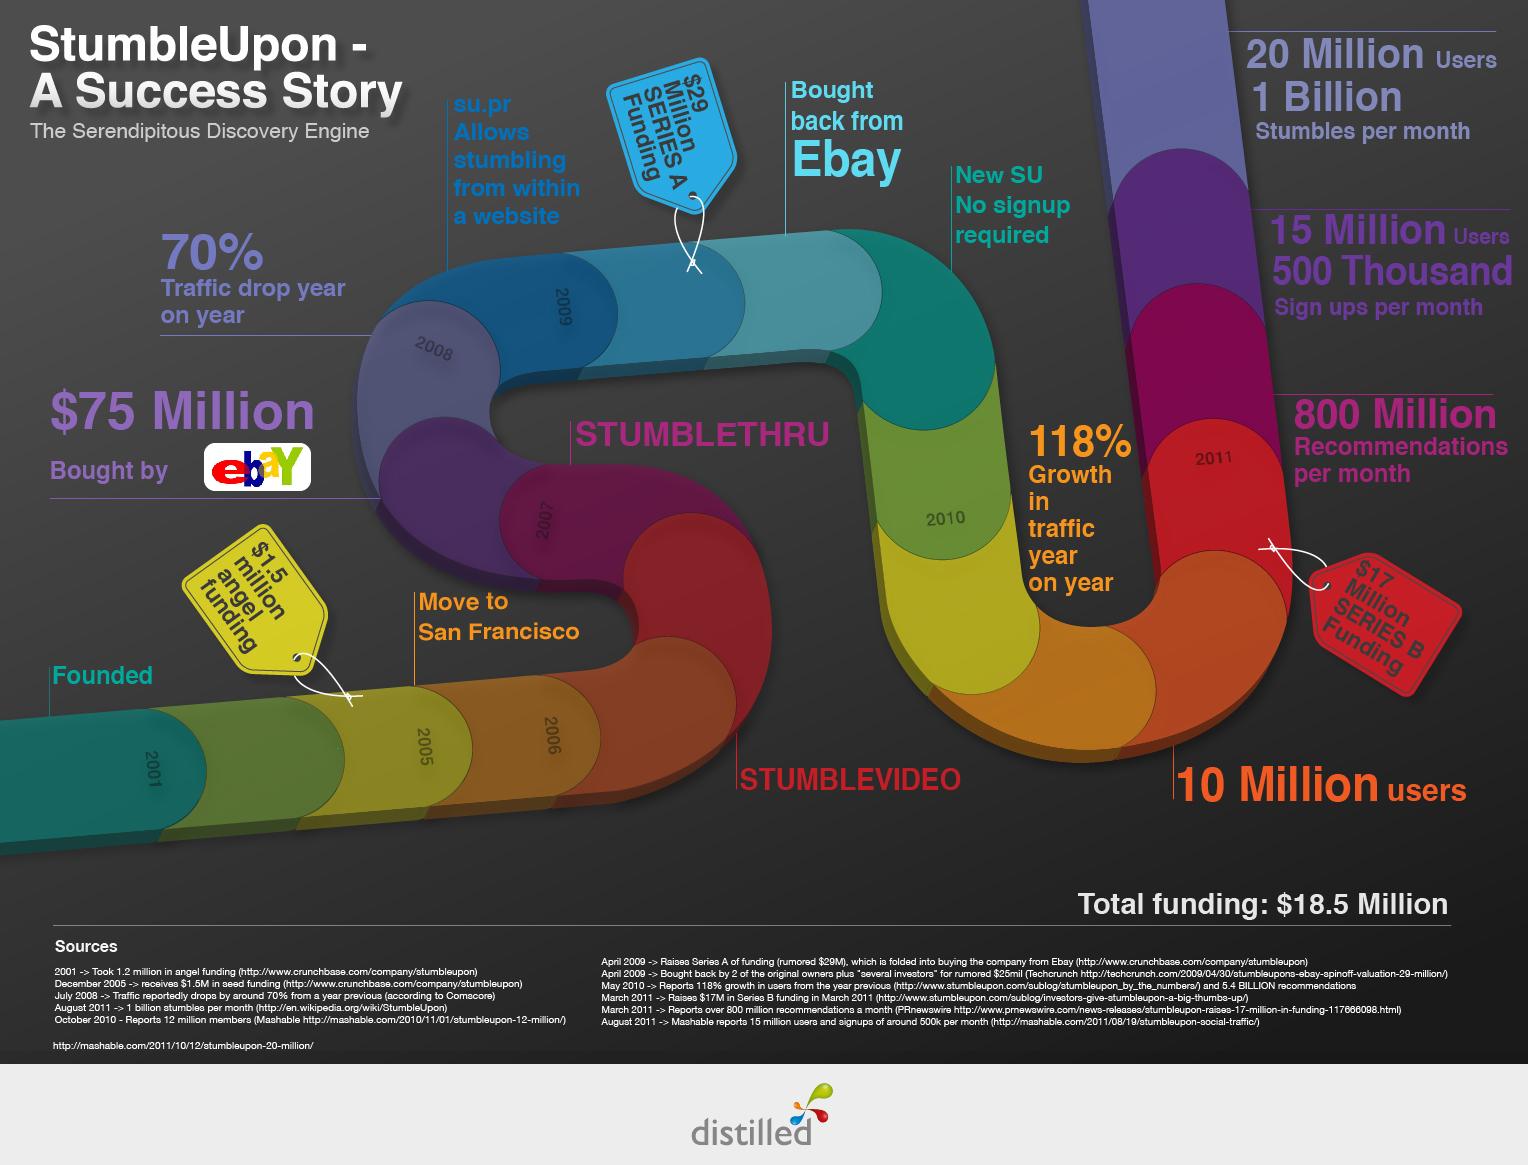 stumbleupon-infographic2